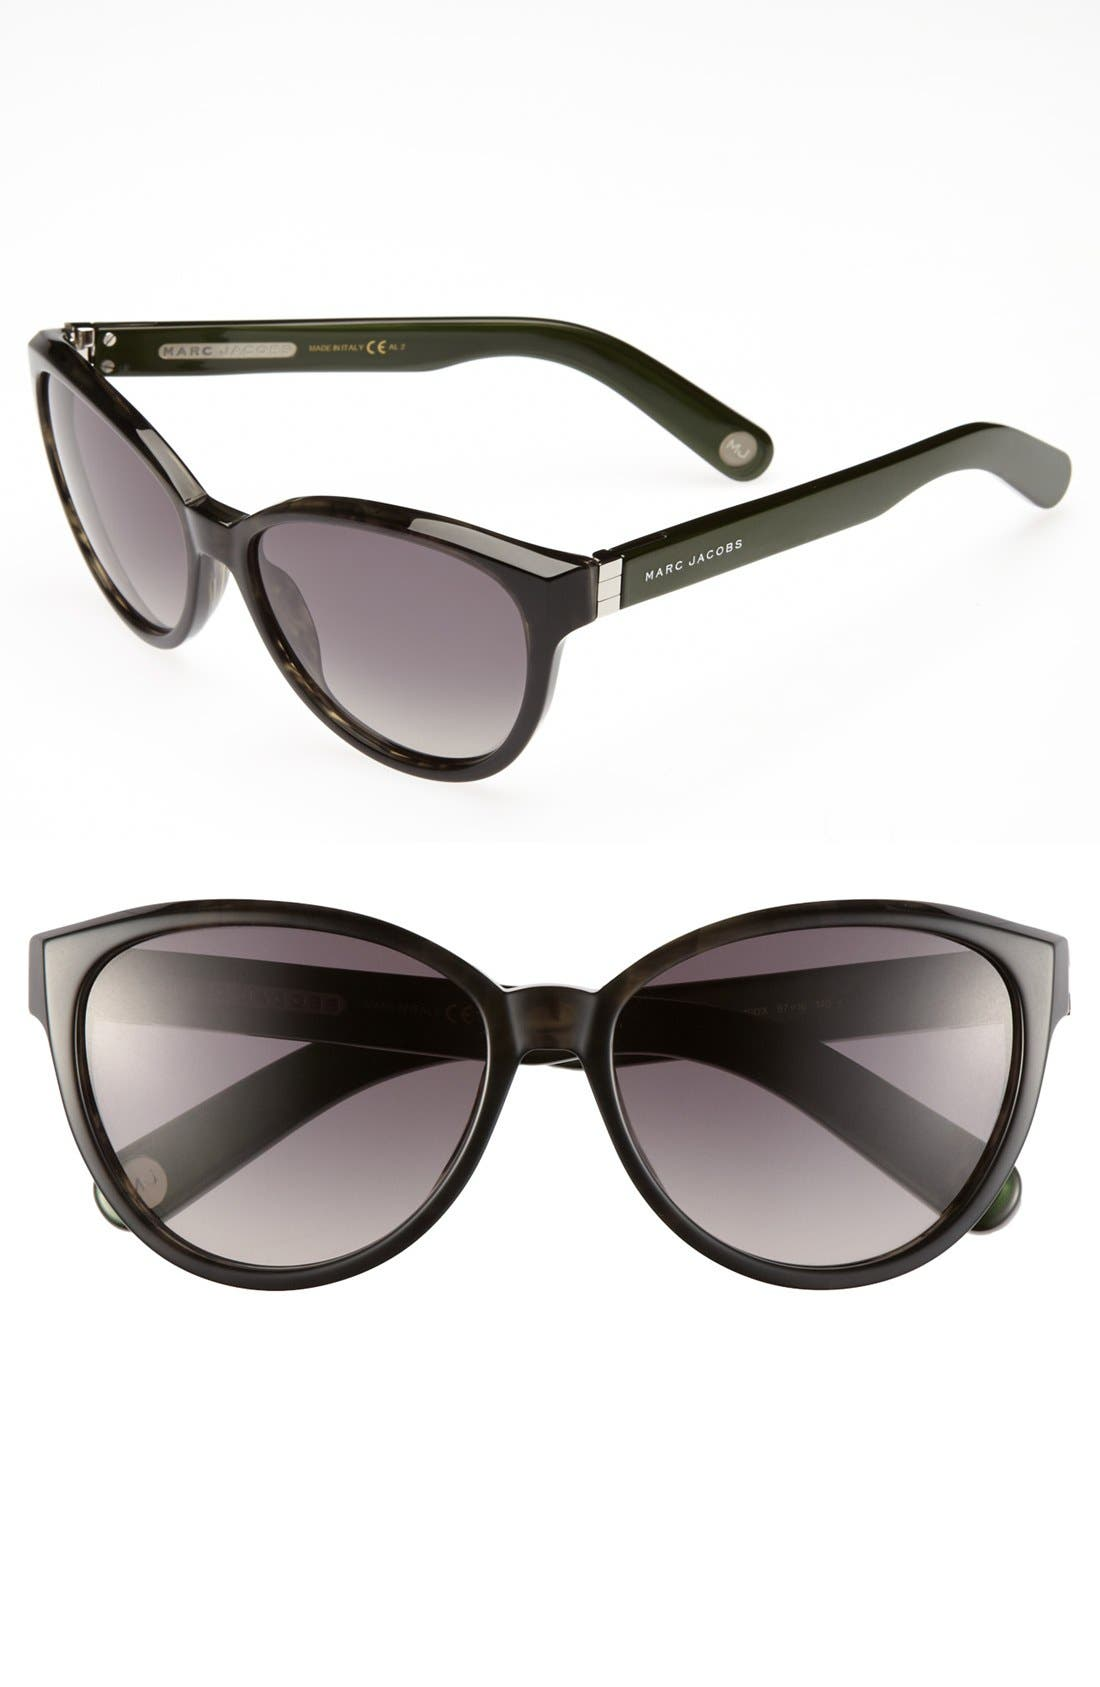 Main Image - MARC JACOBS 57mm Retro Sunglasses